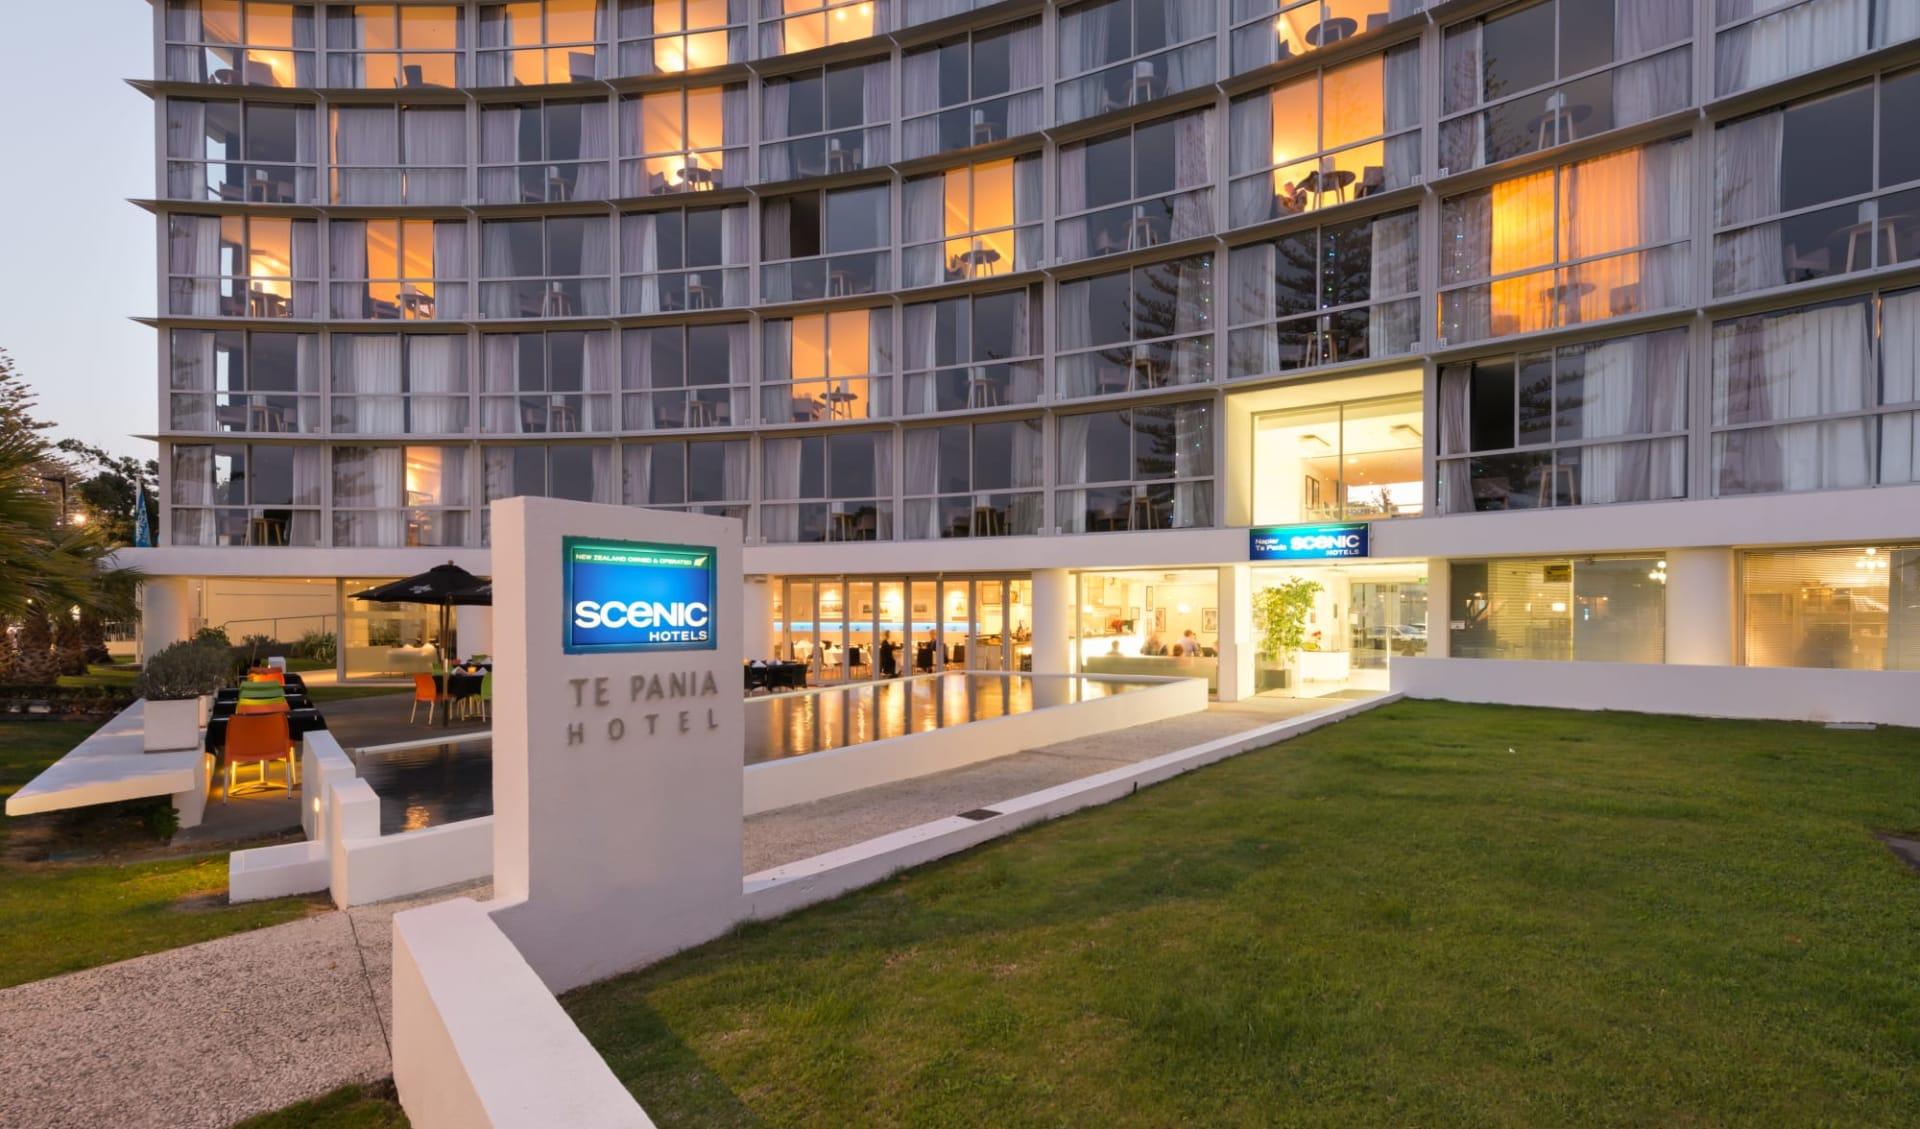 Scenic Hotel Te Pania in Napier: Exterior Scenic Hotel Te Pania - Eingang  c Scenichotelgroup